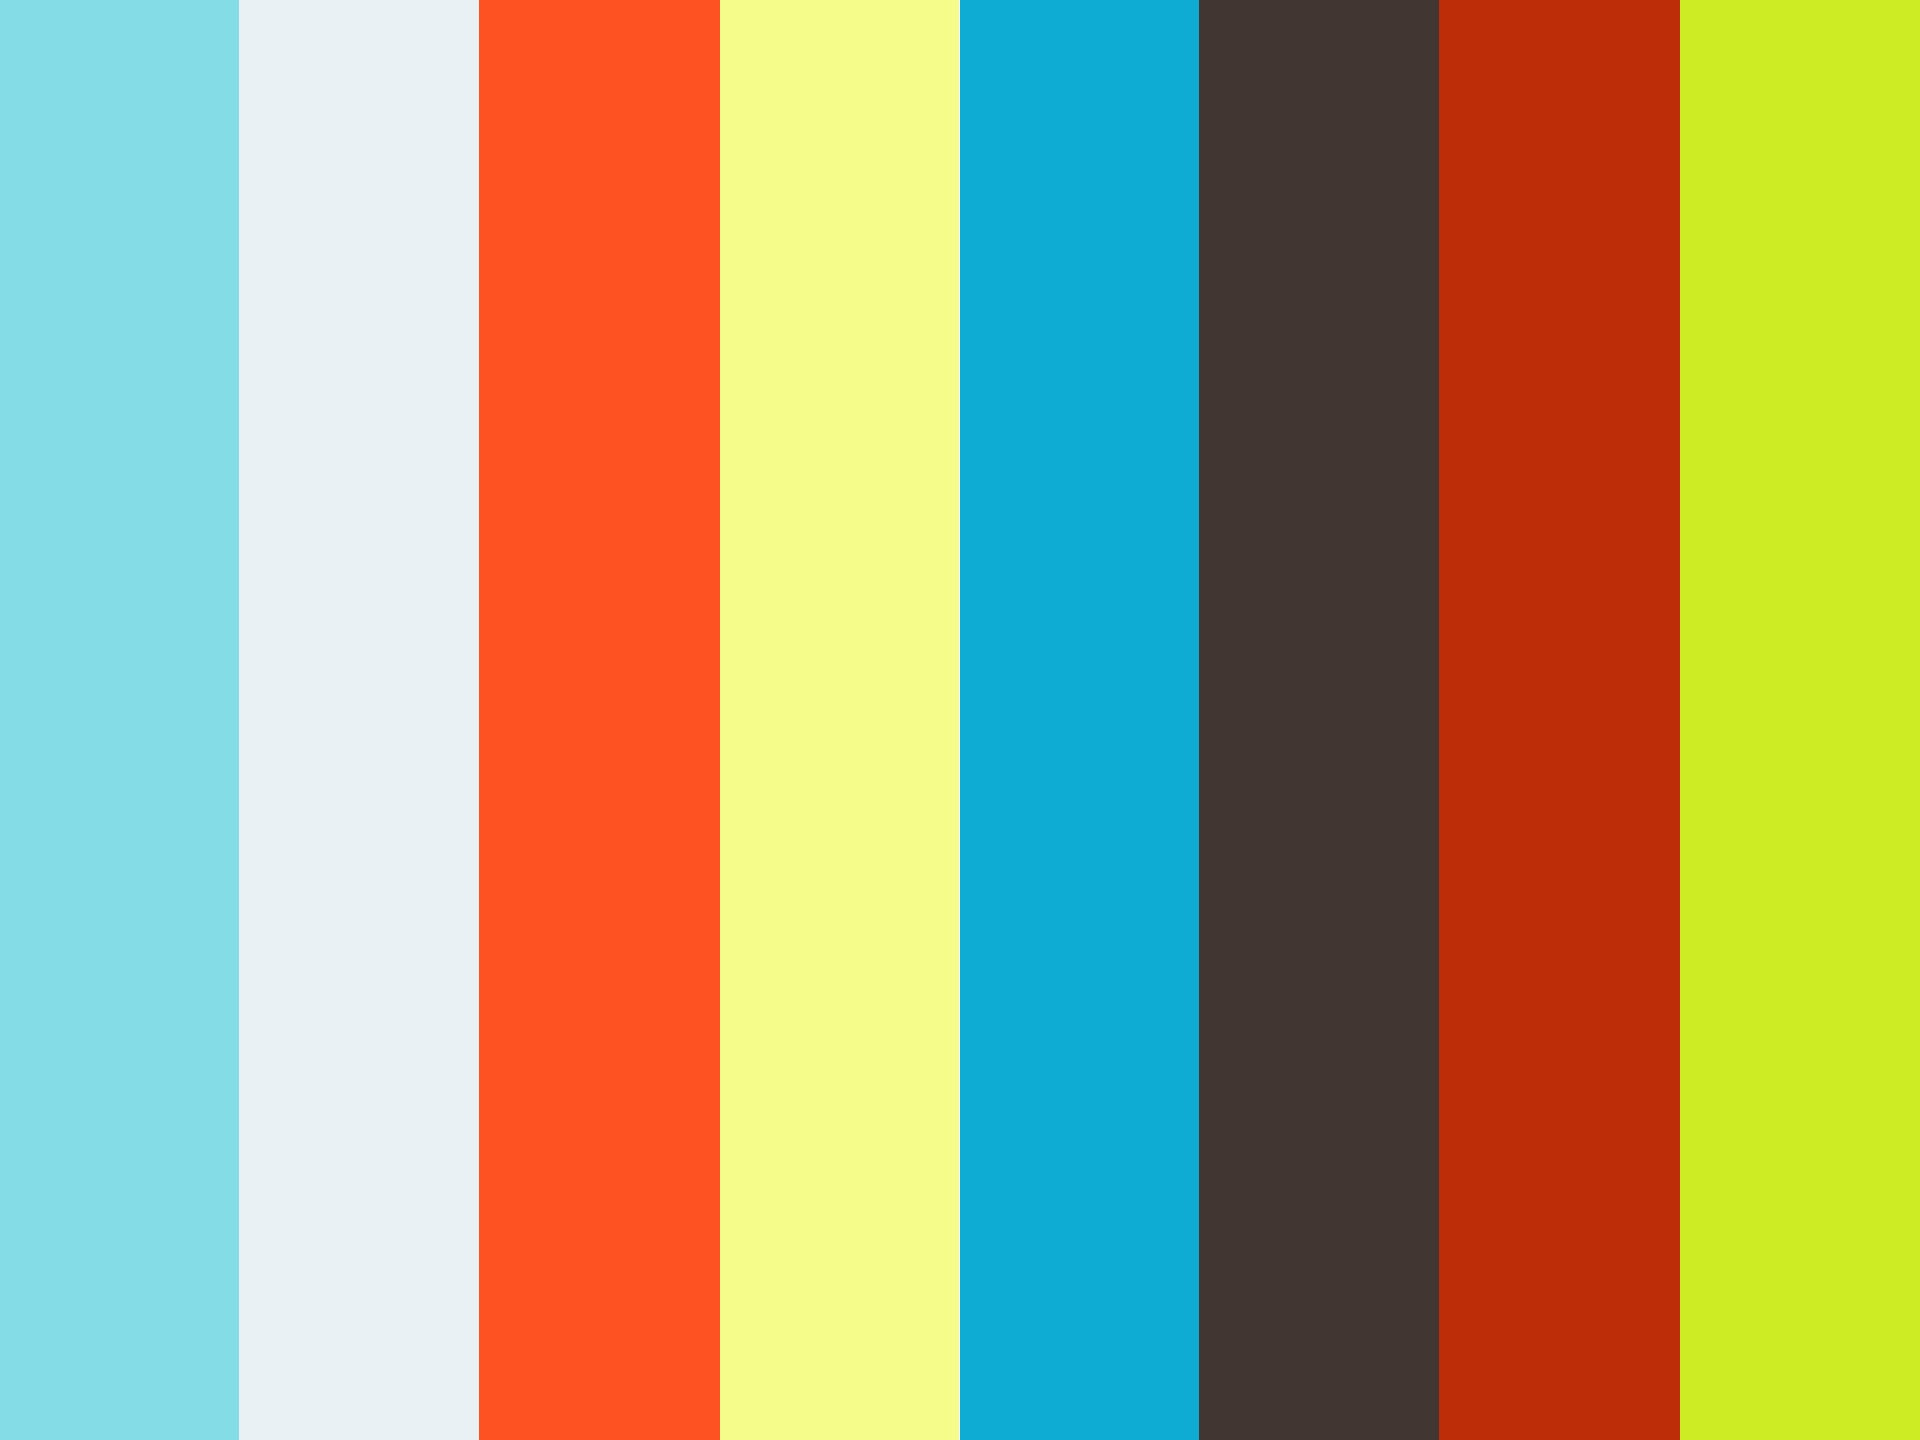 DODGE CHARGER - BLUE - 2017